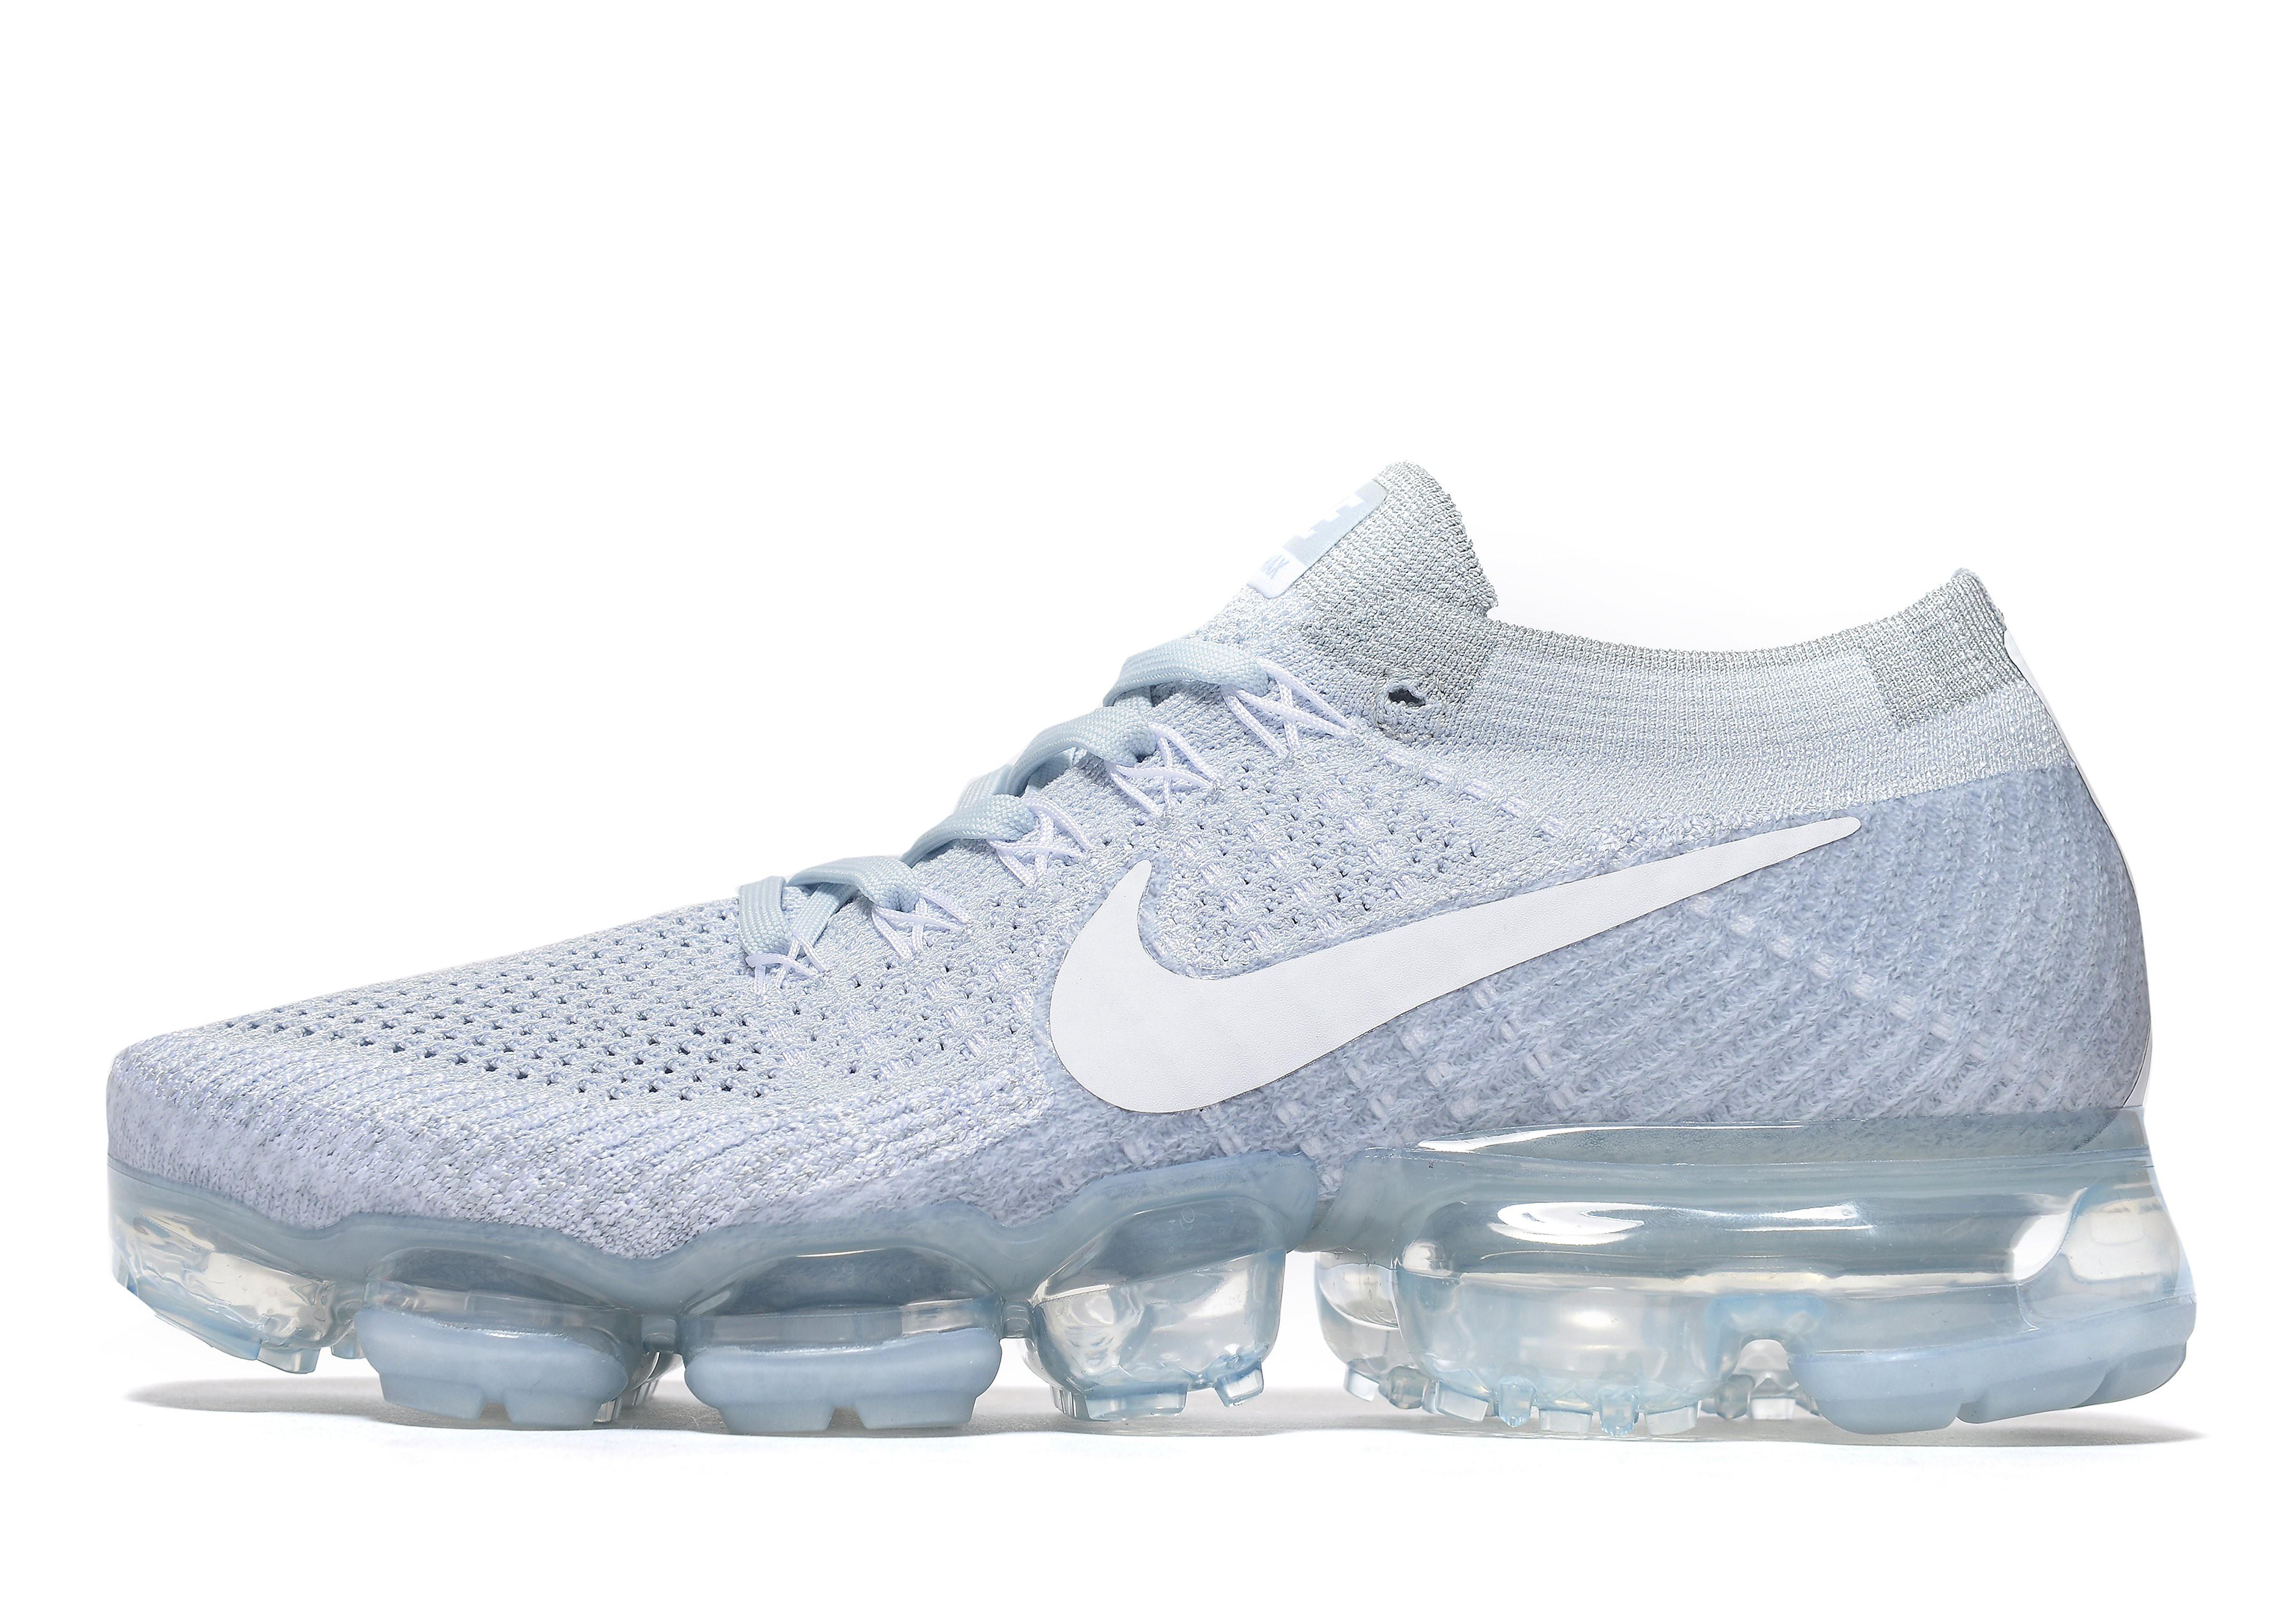 Nike Air VaporMax Women's White